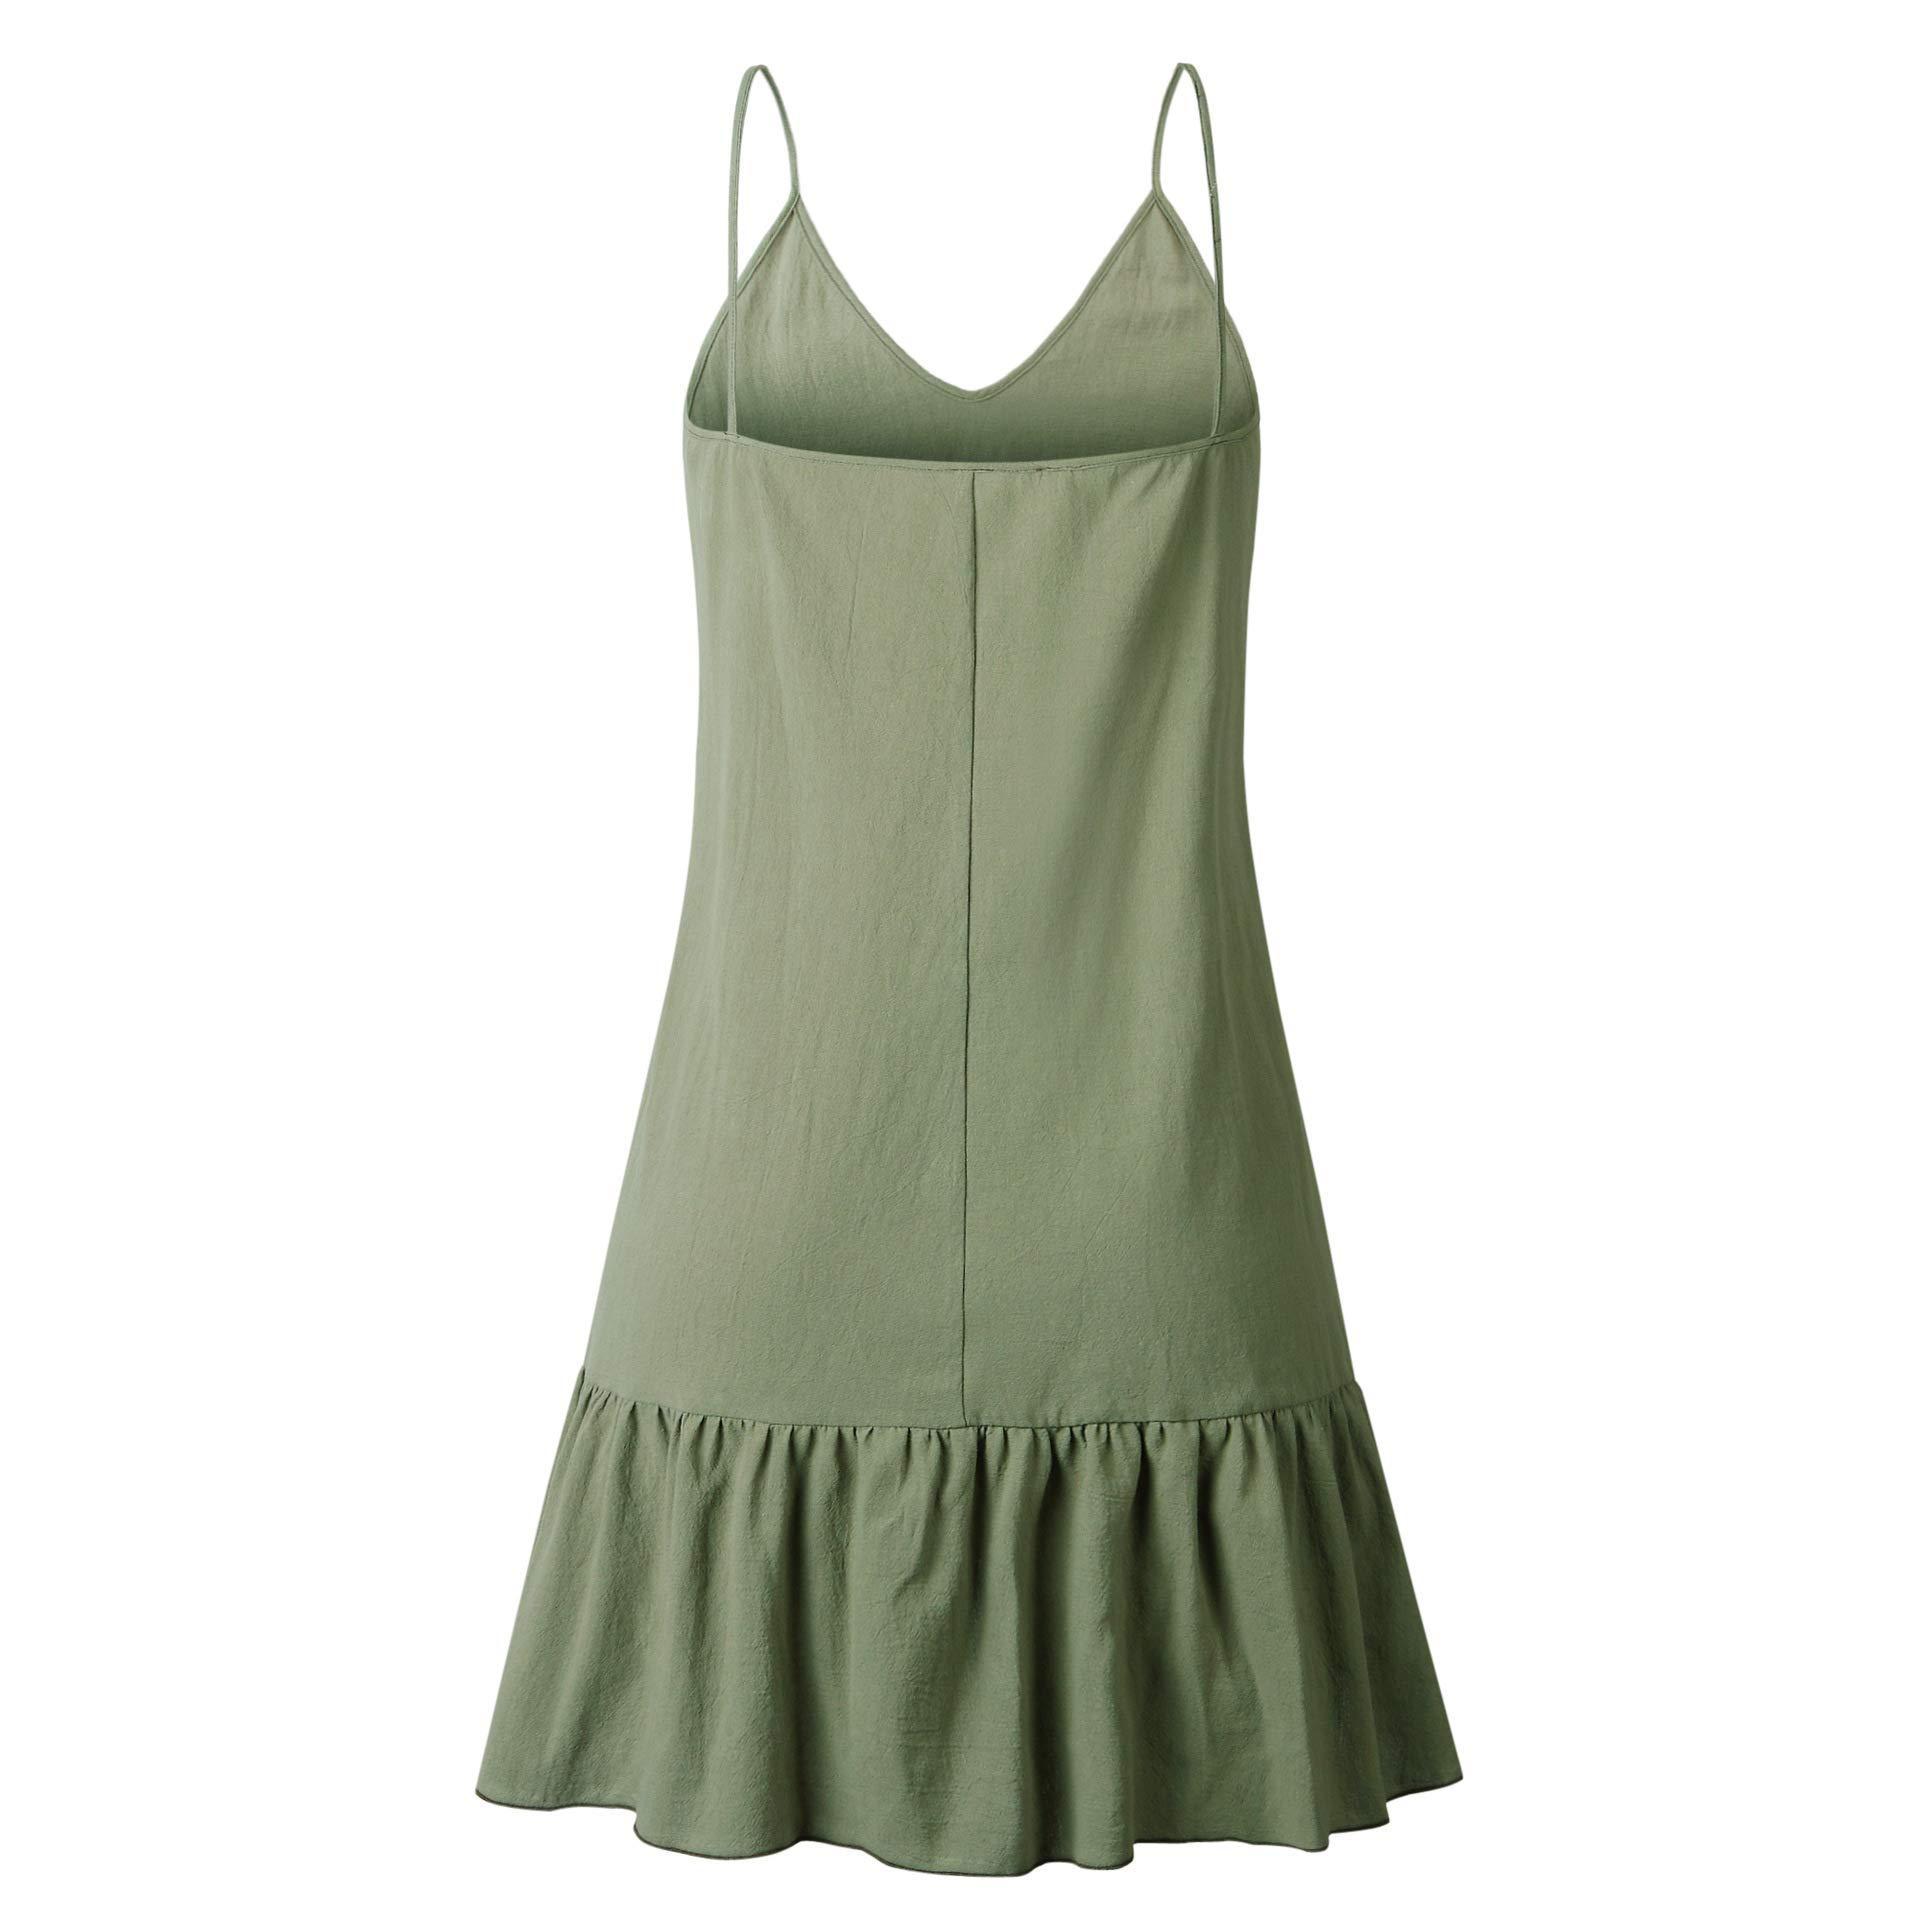 Annystore Women\'s Sleeveless Shift Dress - Spaghetti Strap V Neck Floral Print Flowy Ruffle Beach Short Dress Green L